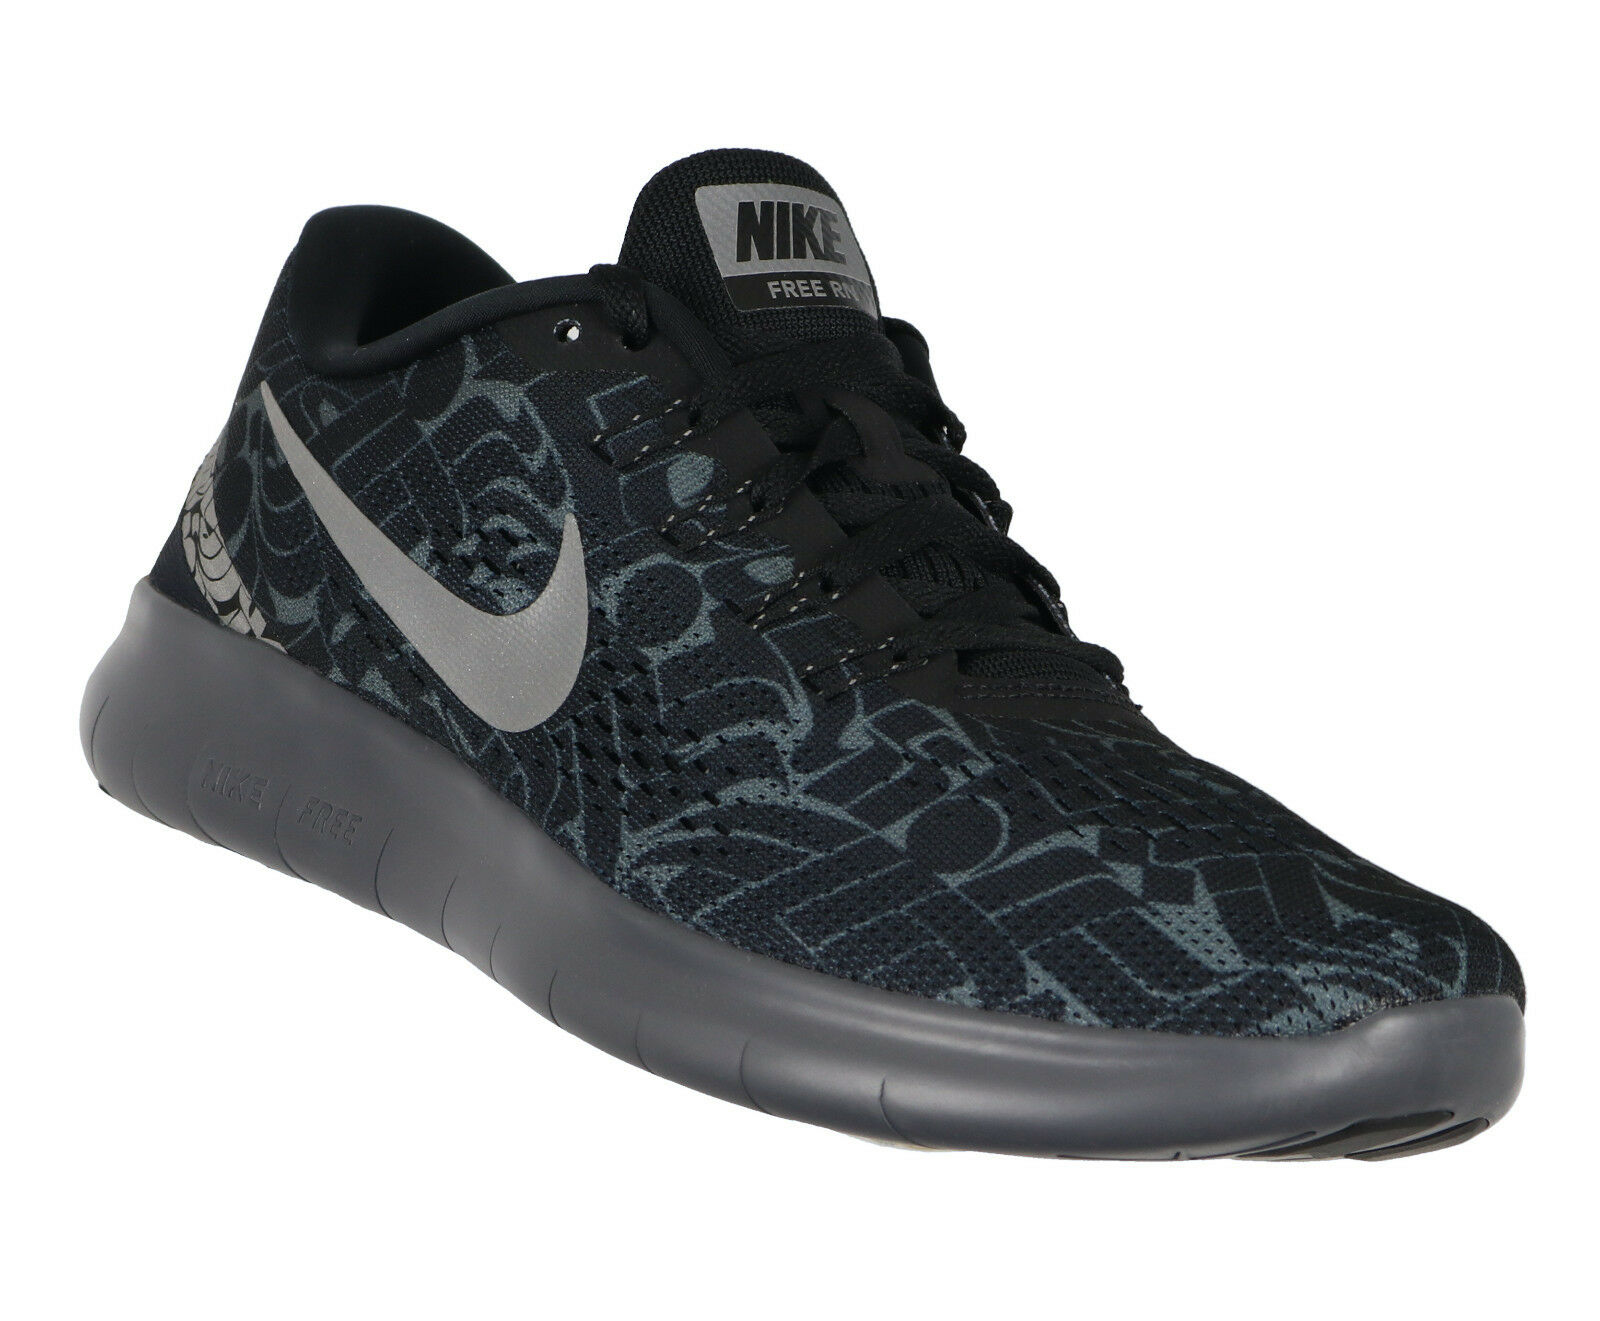 NIKE Donna Donna Donna  Free Run x Rostarr Running scarpe sz 9.5 nero Reflective Trainer RN 0ac3b5